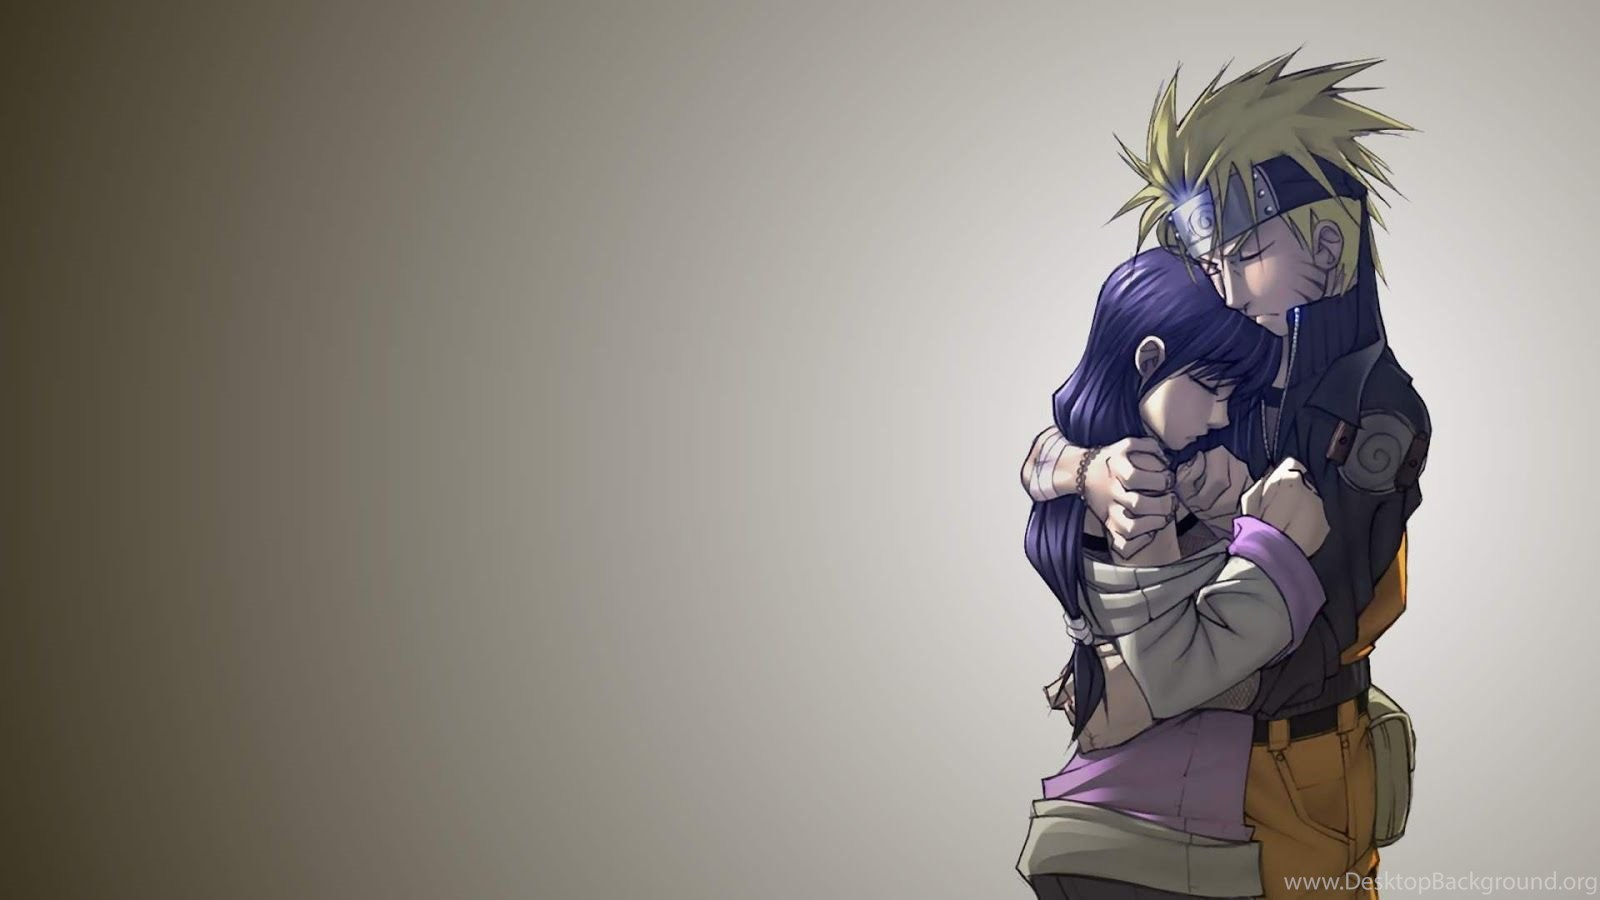 Wallpapers Naruto Dan Hinata Romantis Desktop Background